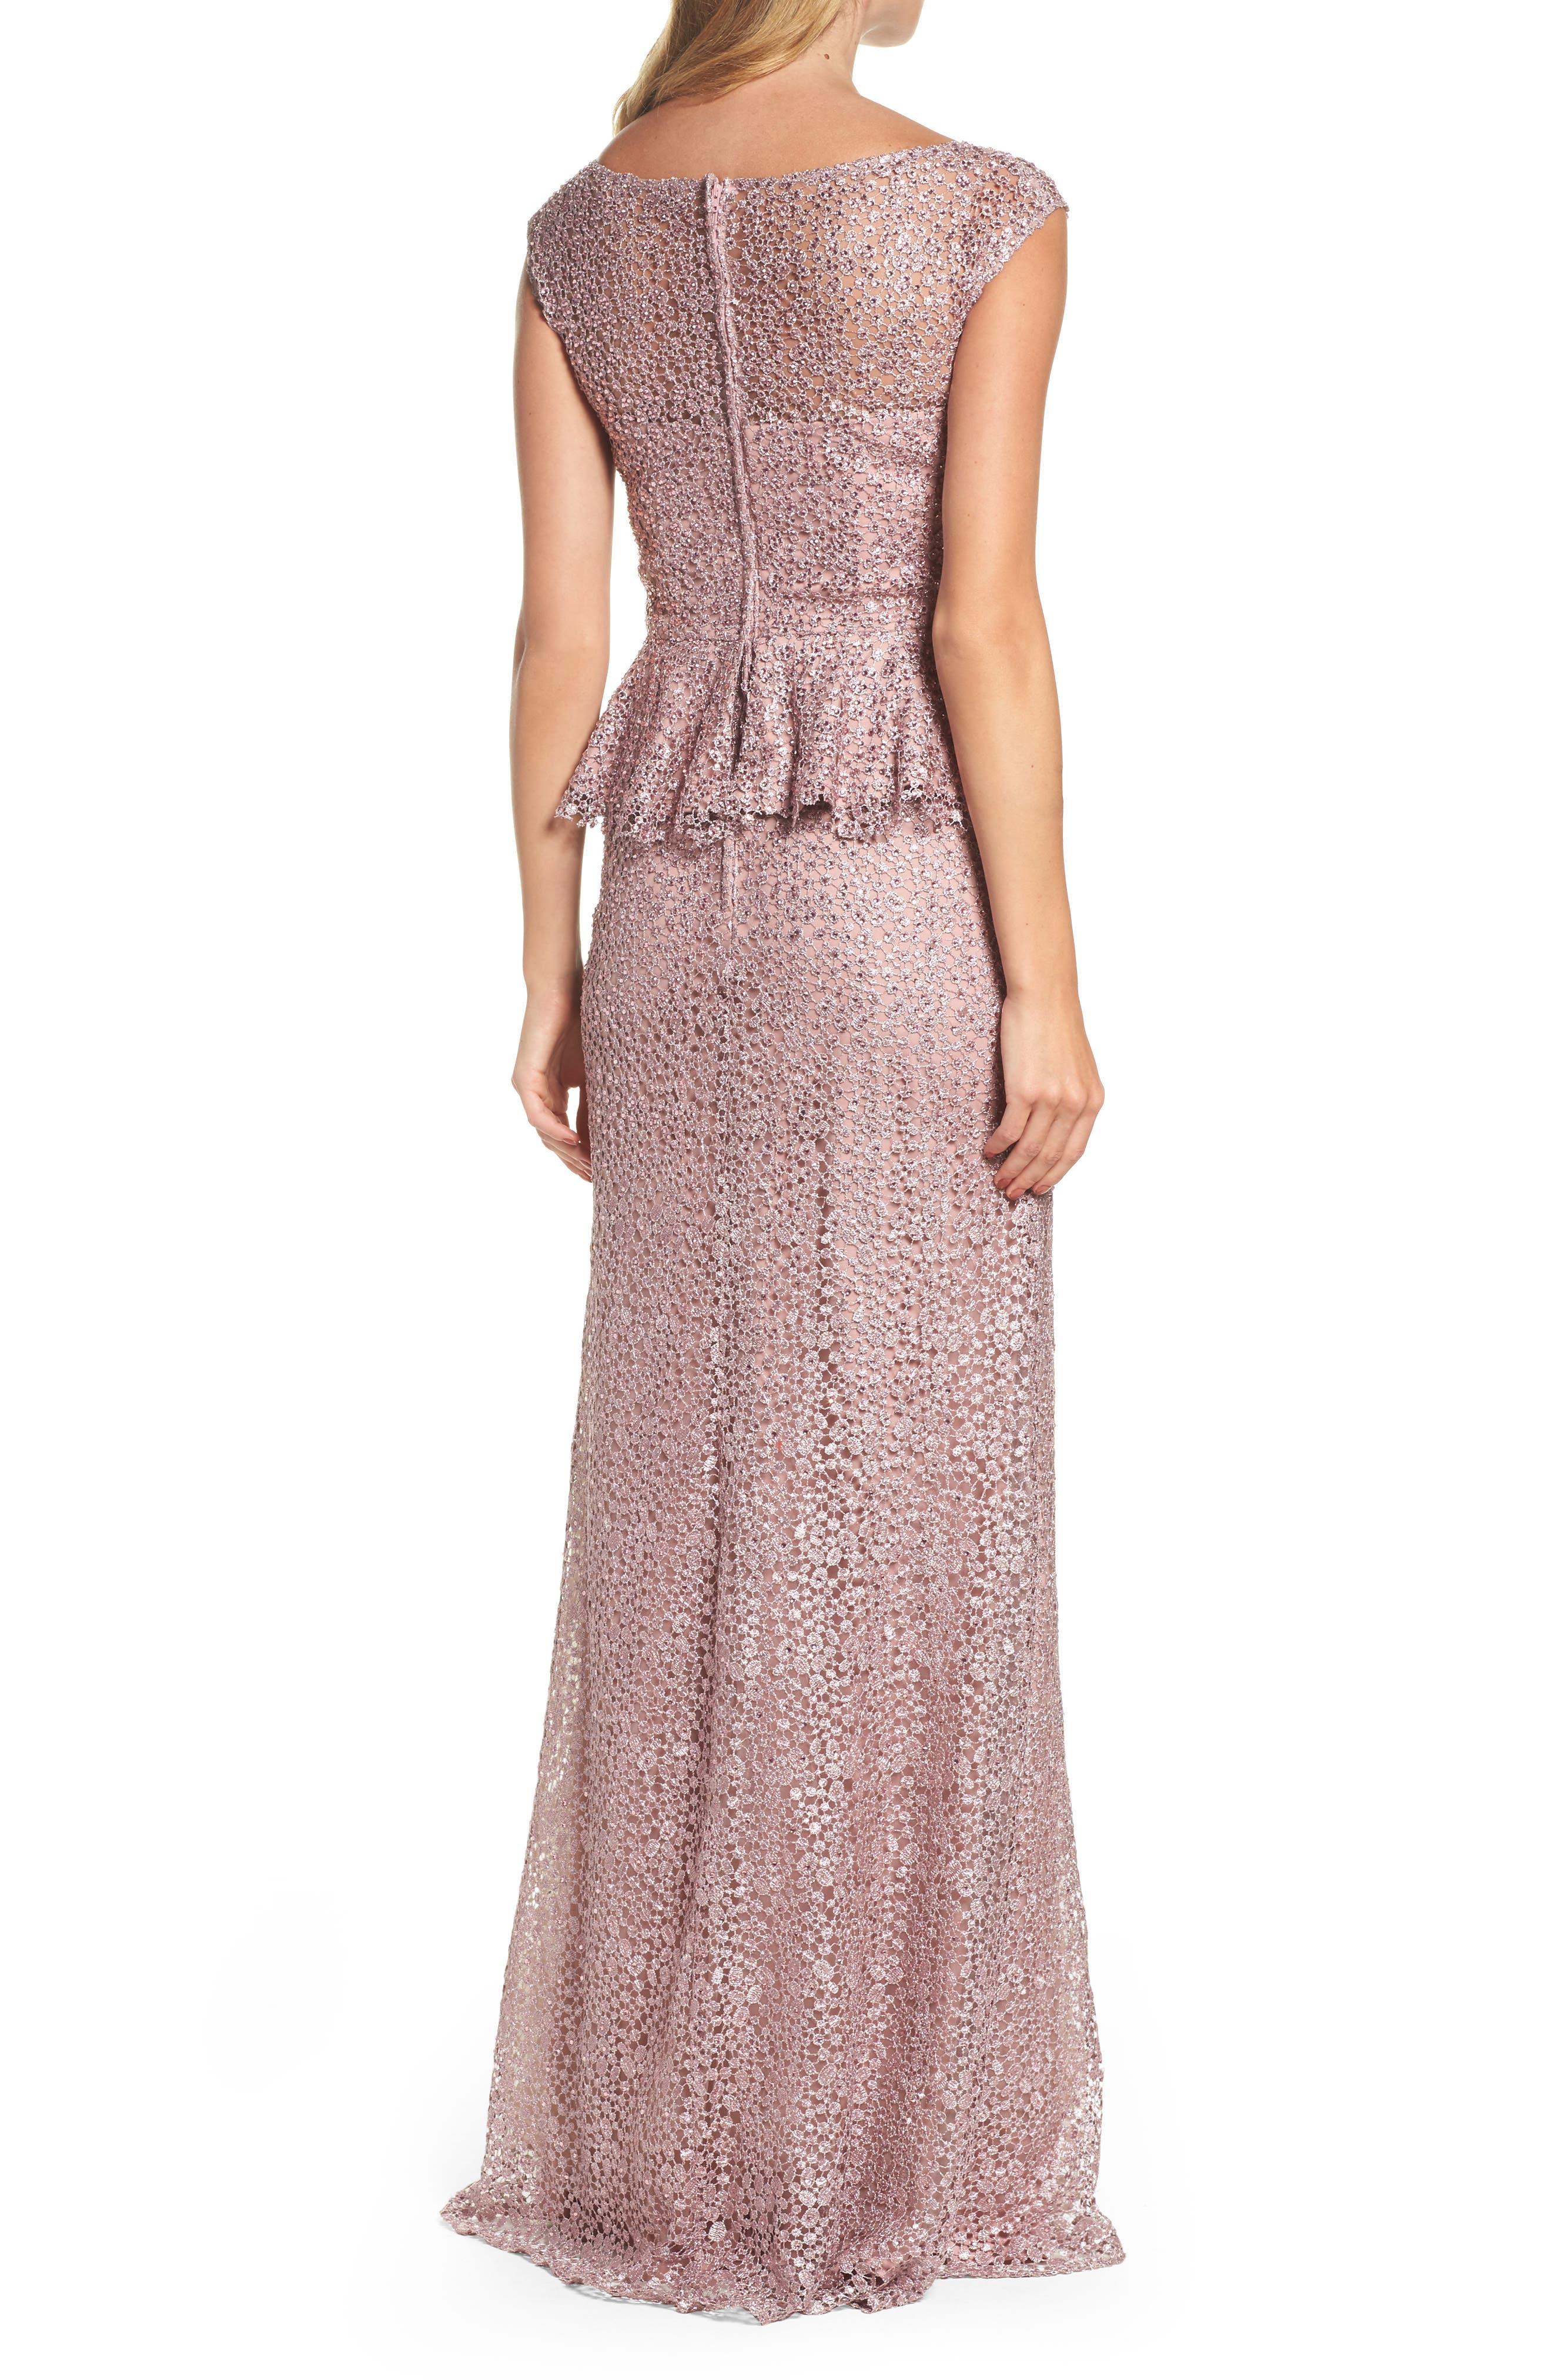 5ba5adbc977 Women's Peplum Wedding-Guest Dresses   Nordstrom